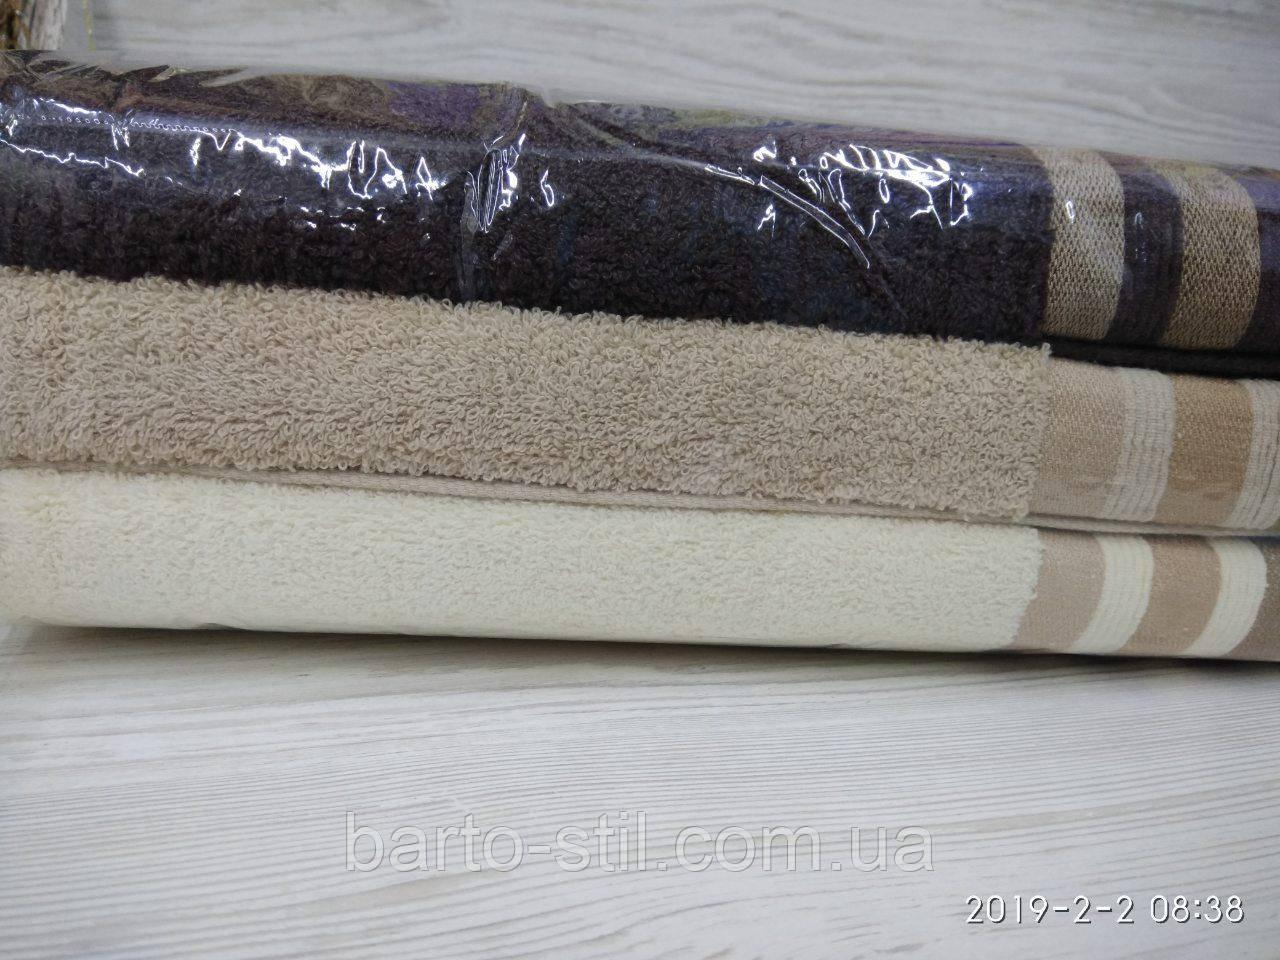 Комплект полотенец для бани Размер 70Х140